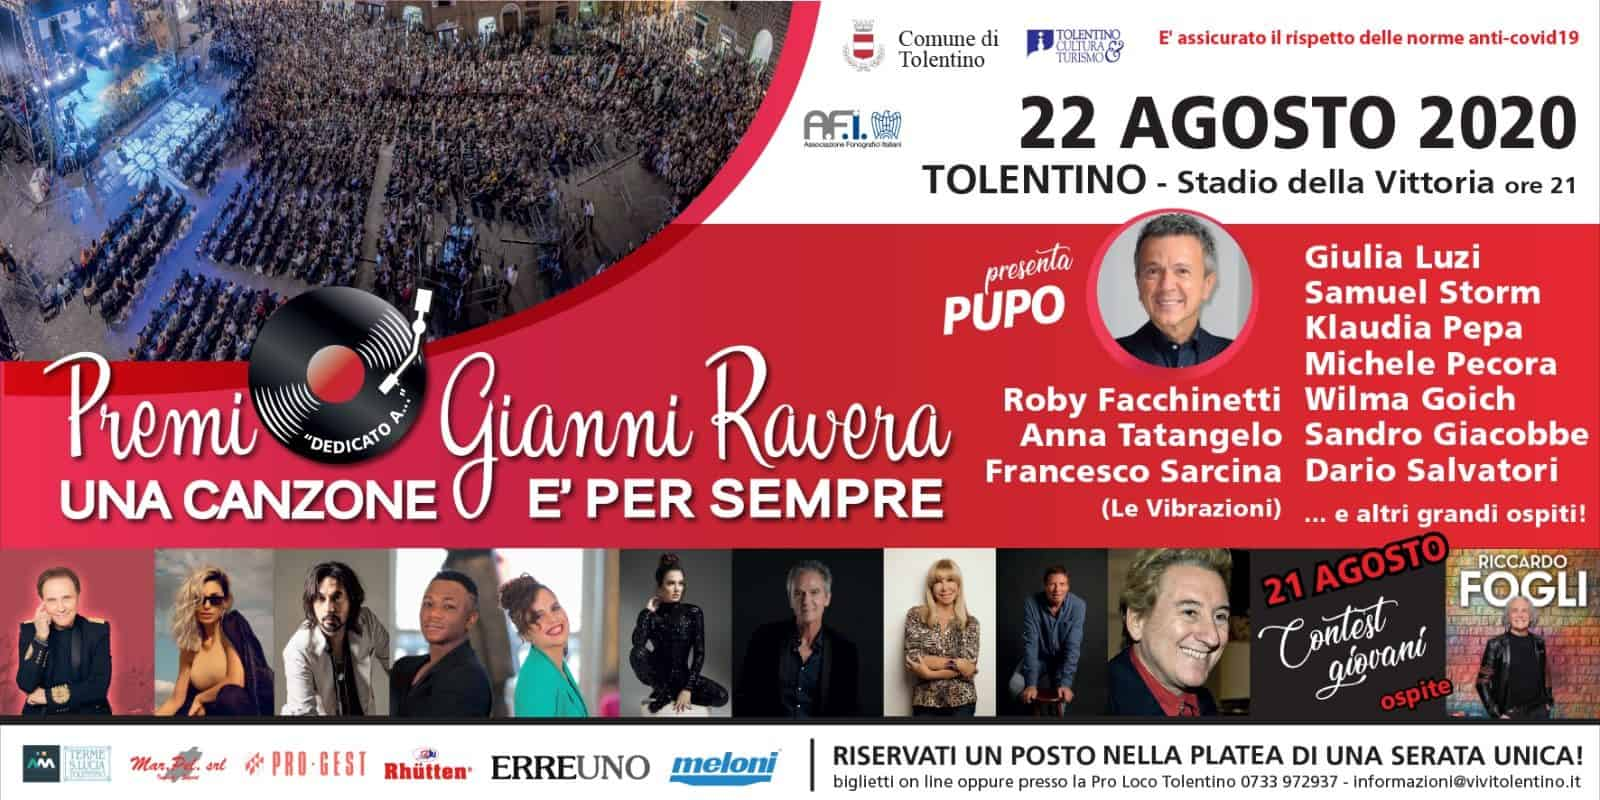 Premio Gianni Ravera 2020 Gran Galà